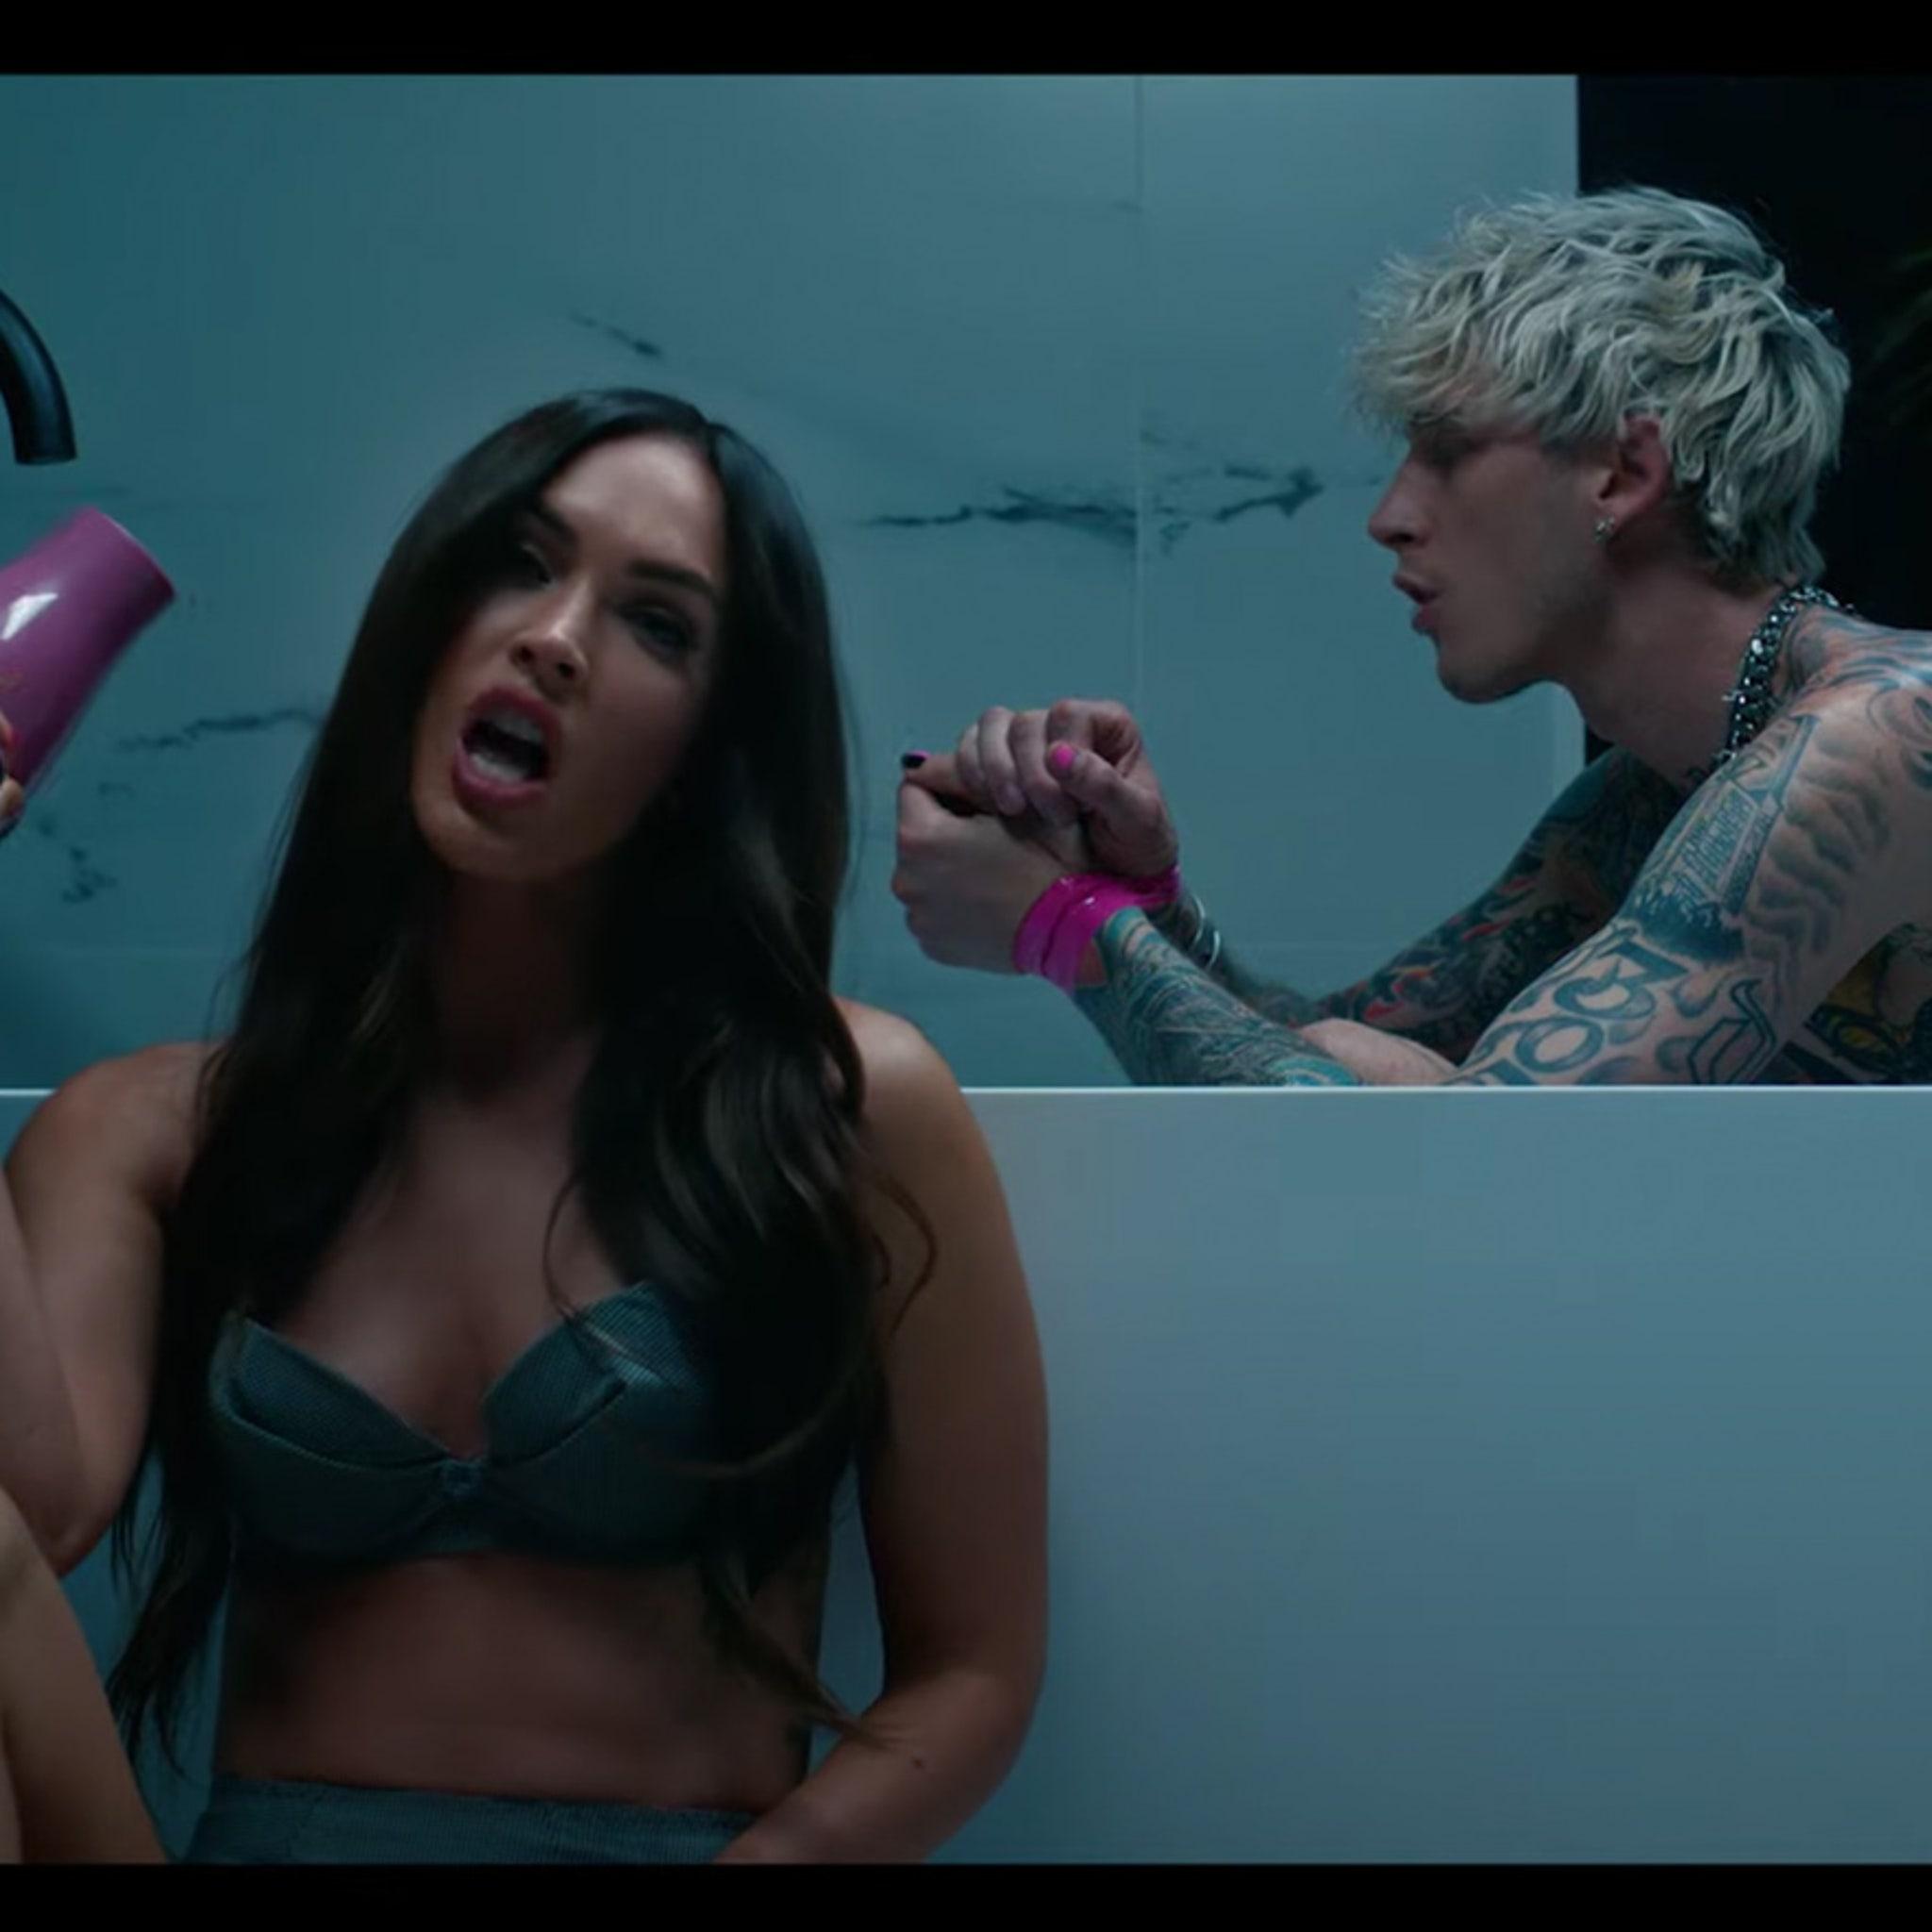 Megan Fox Appears In Machine Gun Kelly S Steamy New Music Video